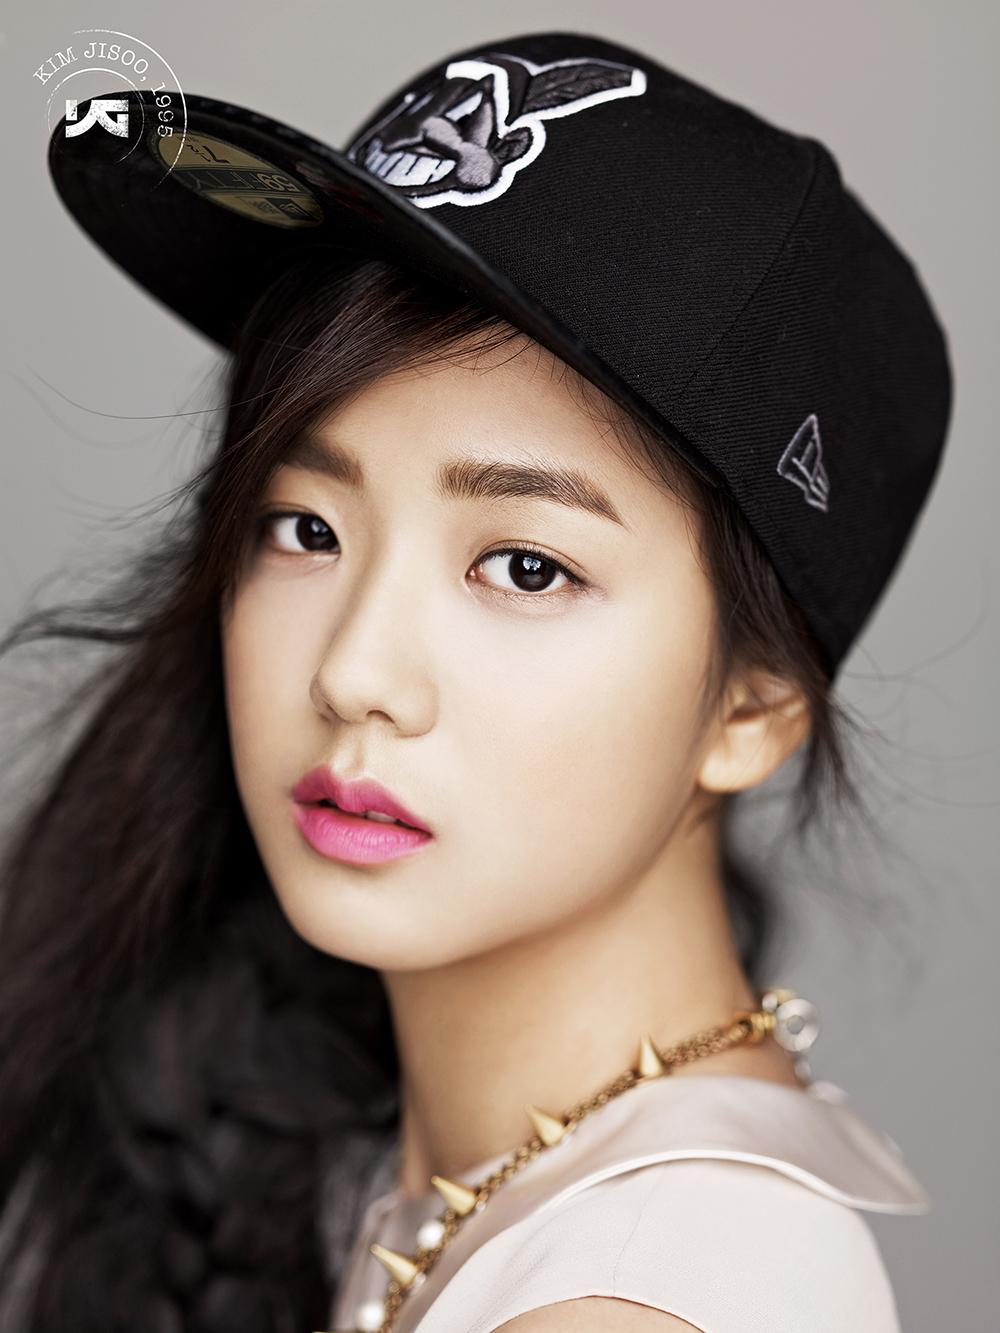 Black Pink : Kim Jisoo (김지수)